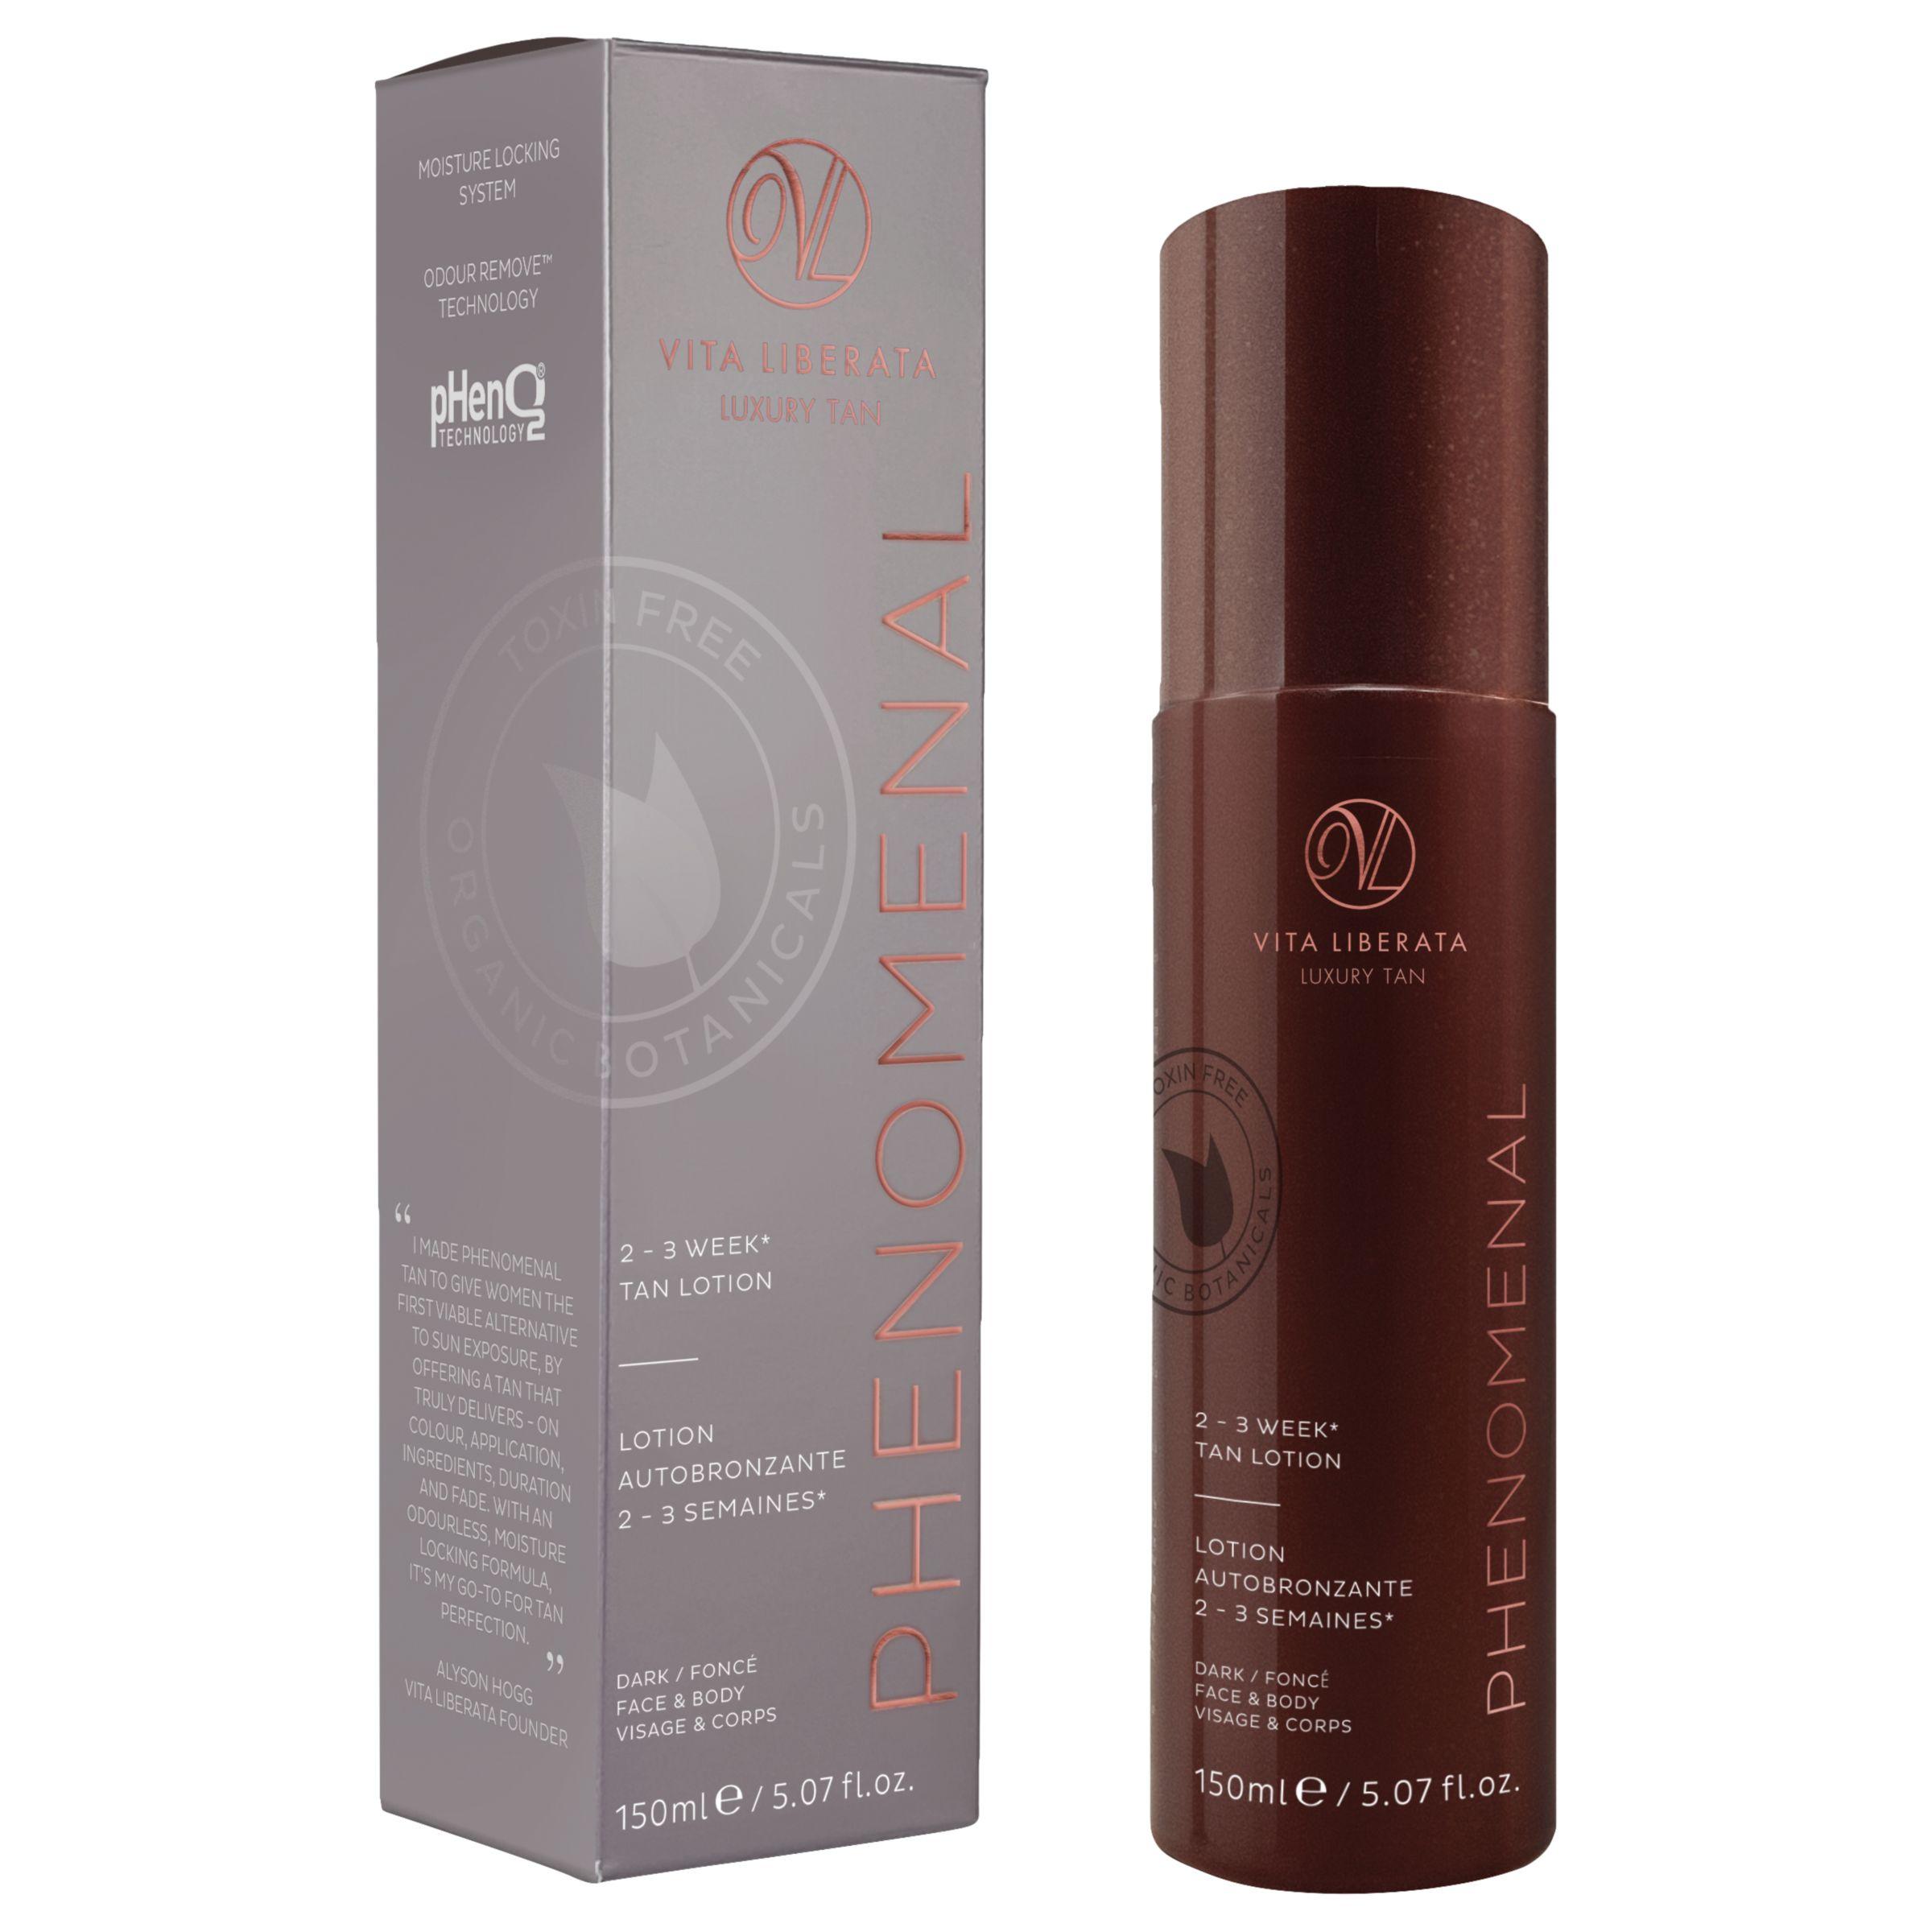 Vita Liberata Vita Liberata pHenomenal 2-3 Week Face & Body Tan Lotion, 150ml